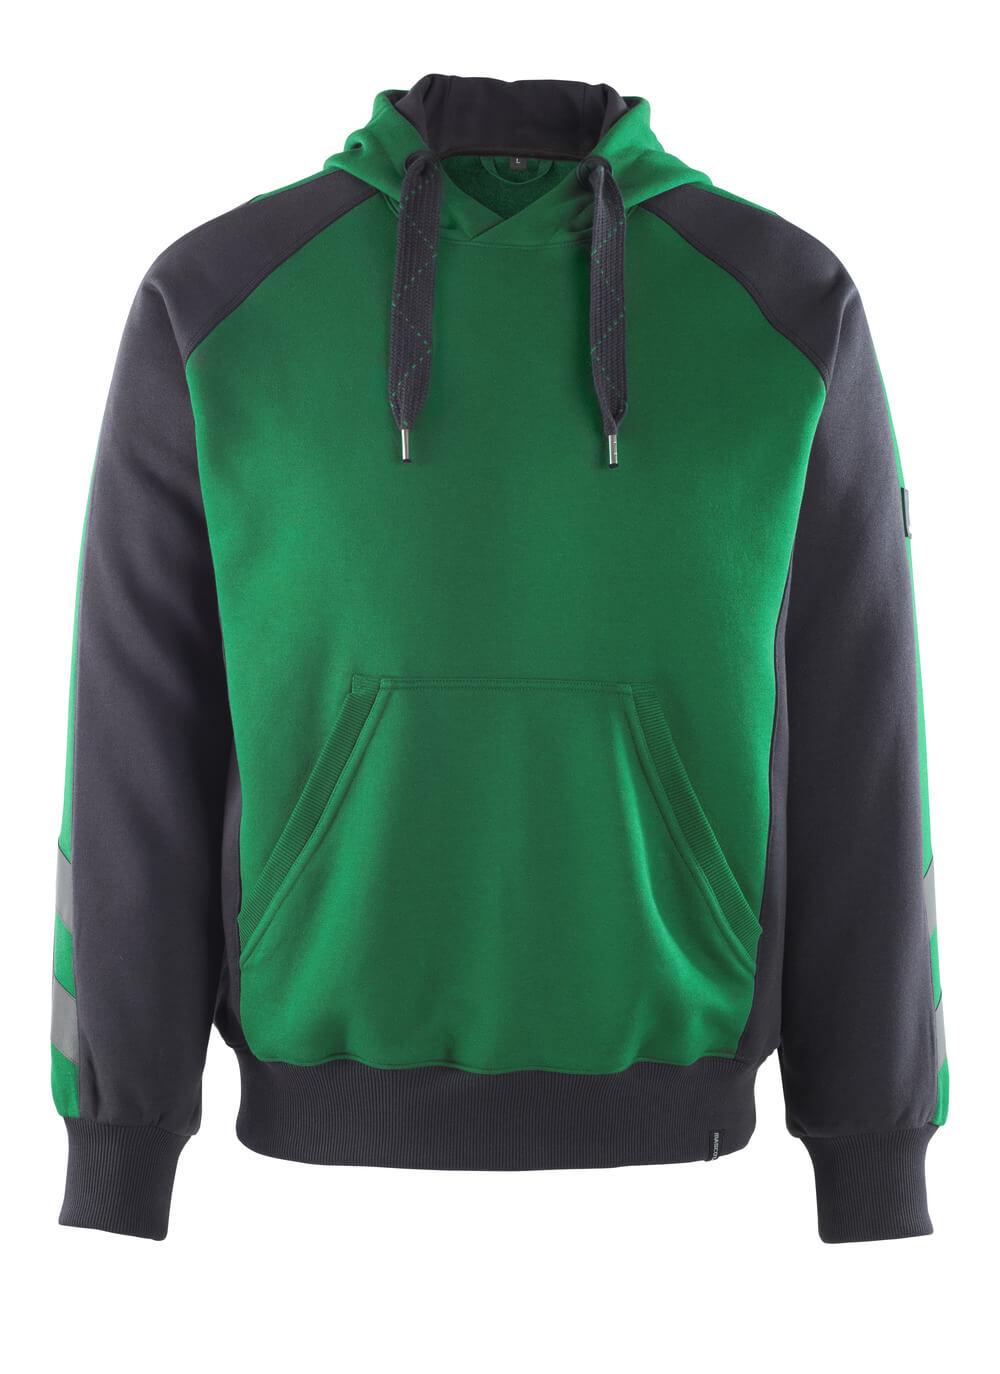 50508-811-0309 Sweat capuche - Vert bouteille/Noir